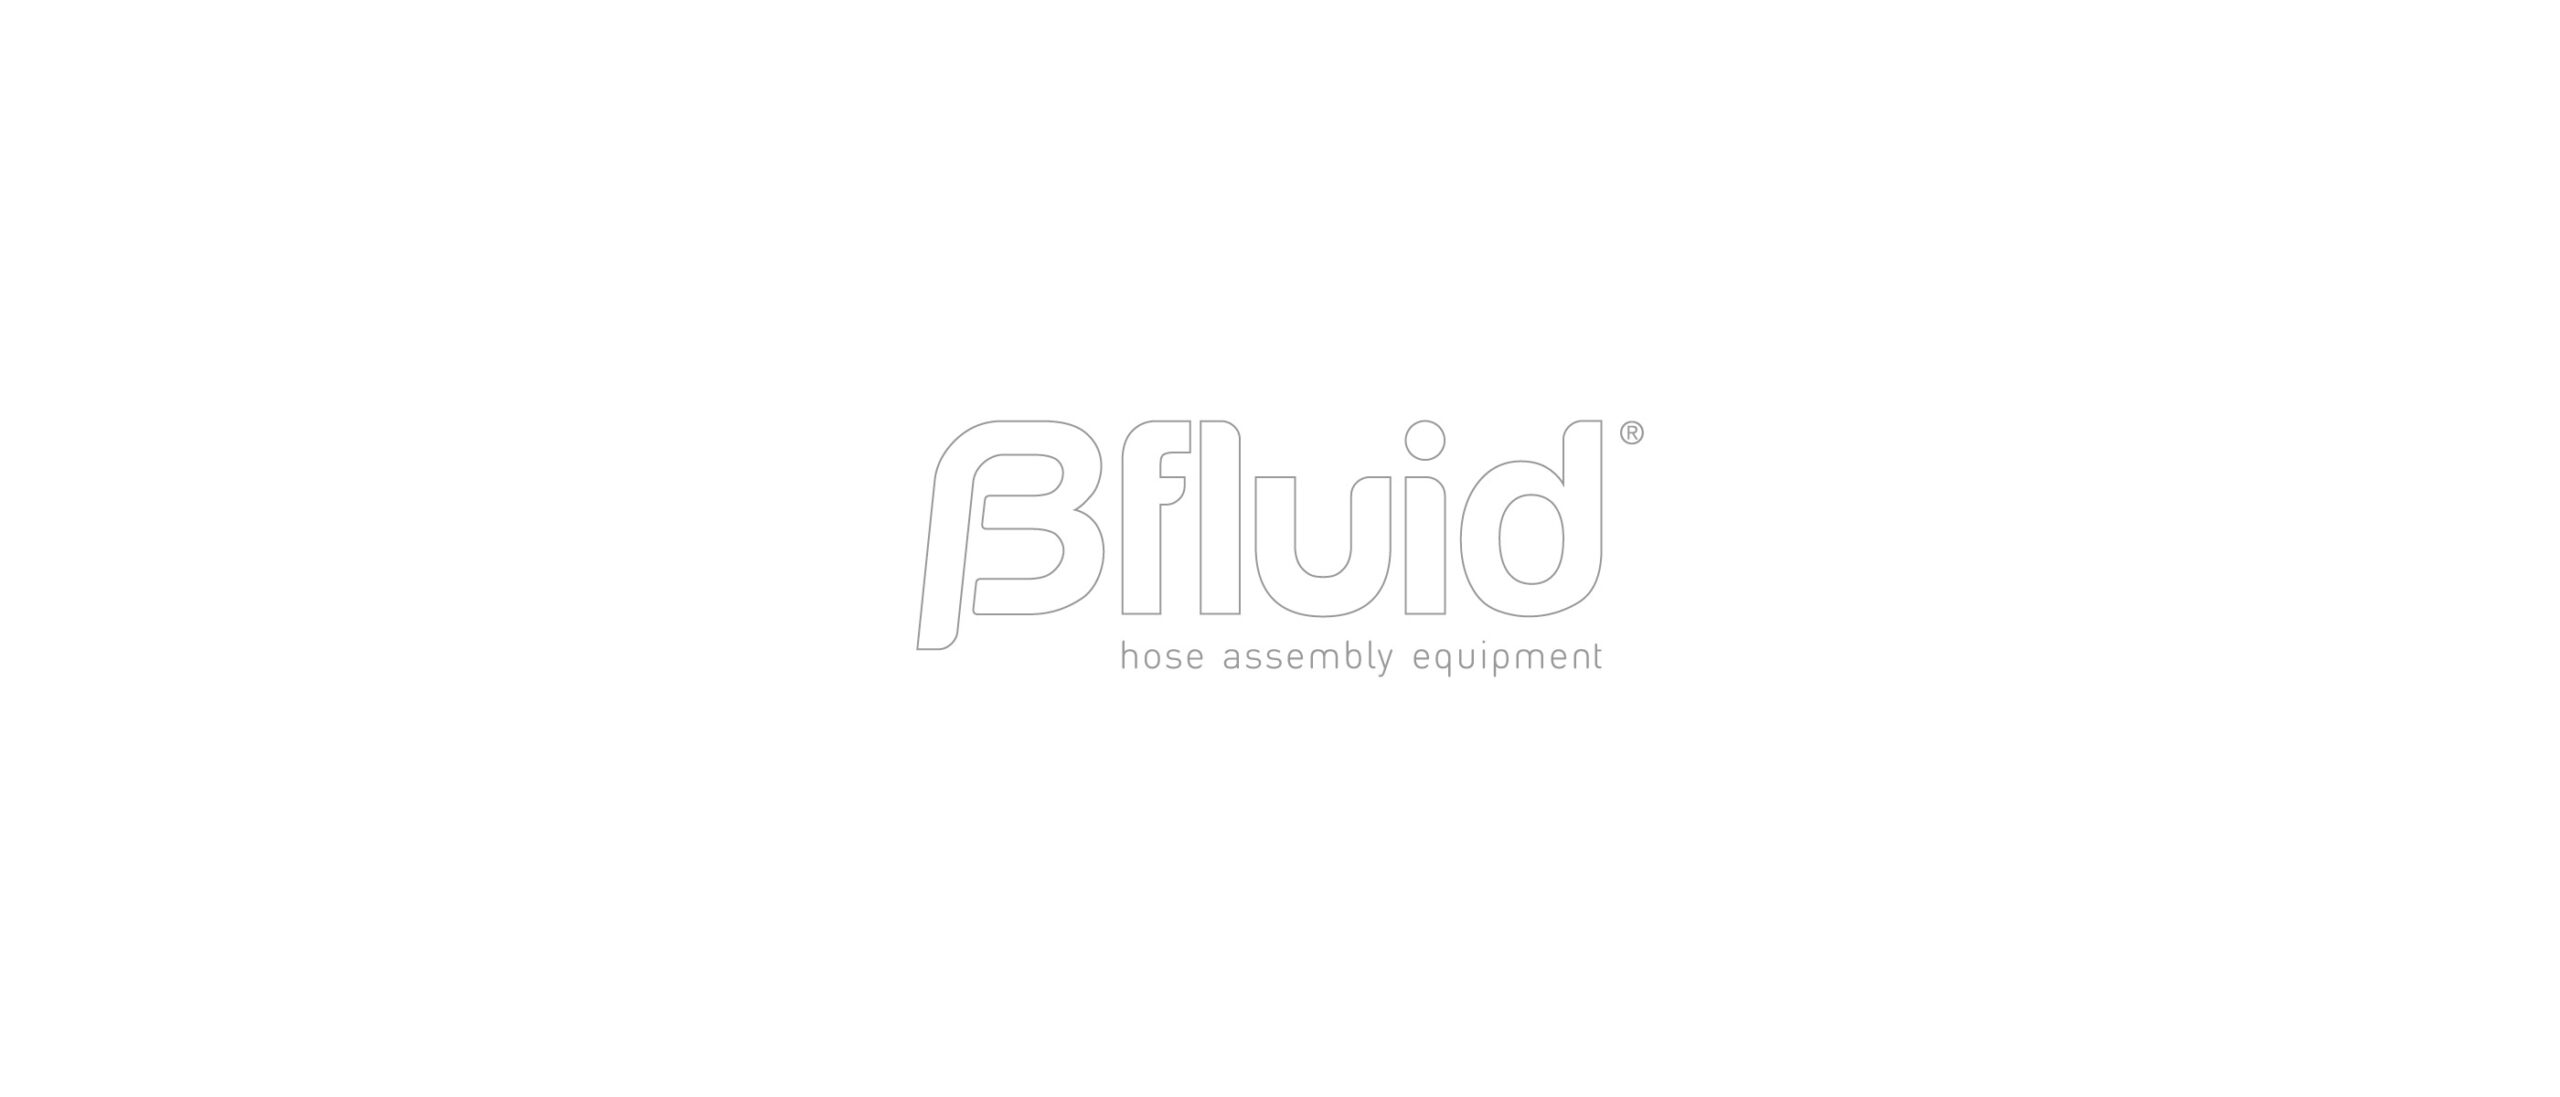 bfluid_002_1